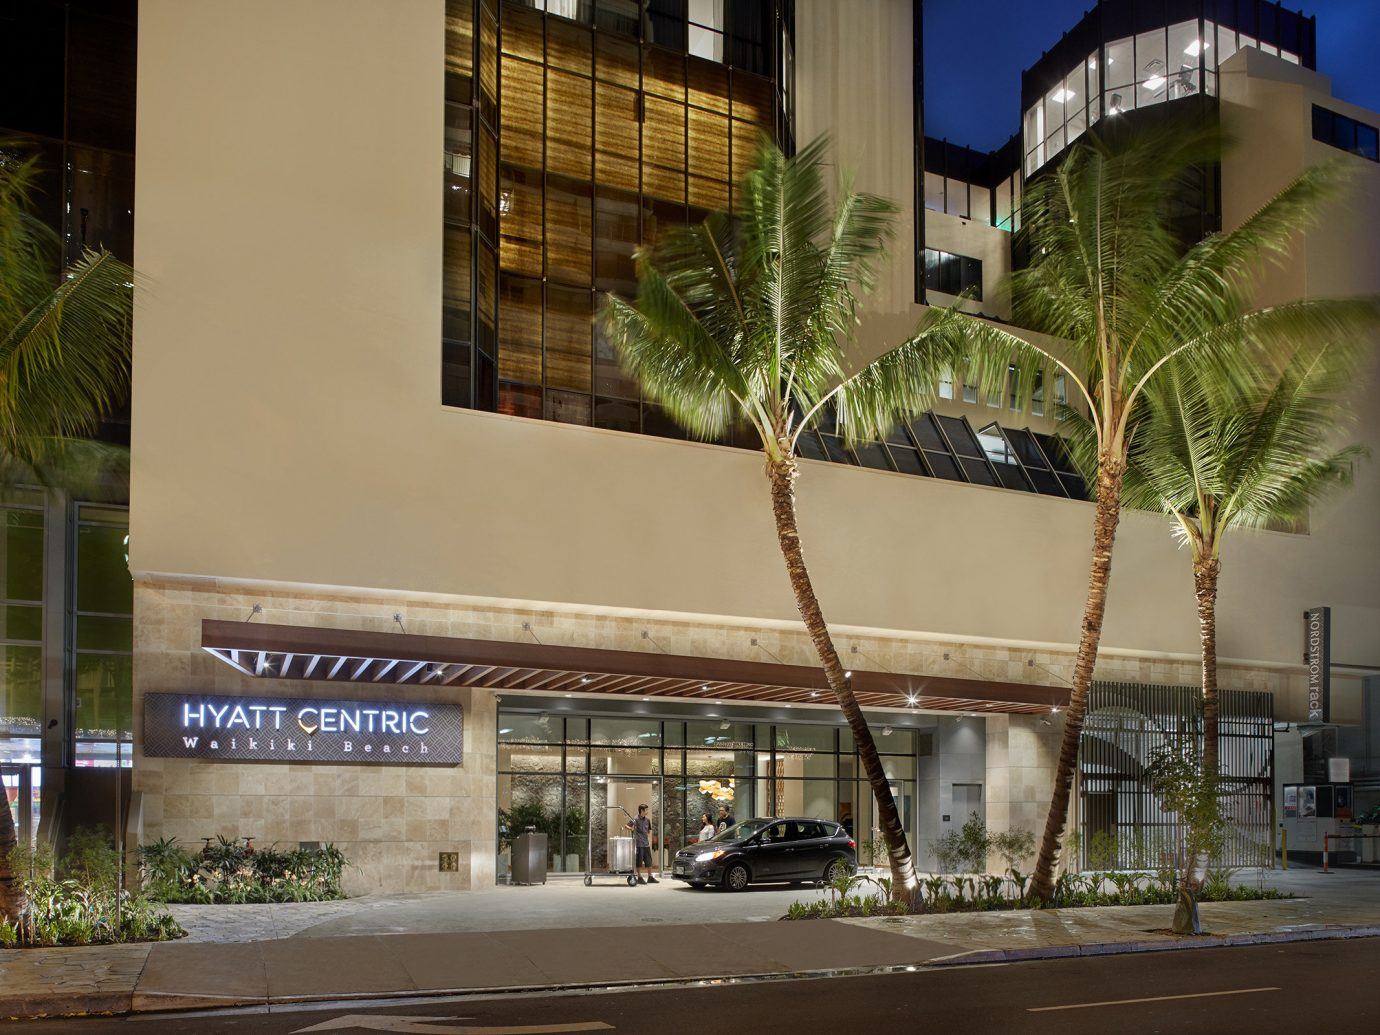 Boutique Hotels outdoor urban area neighbourhood shopping mall Architecture Downtown plaza condominium facade retail